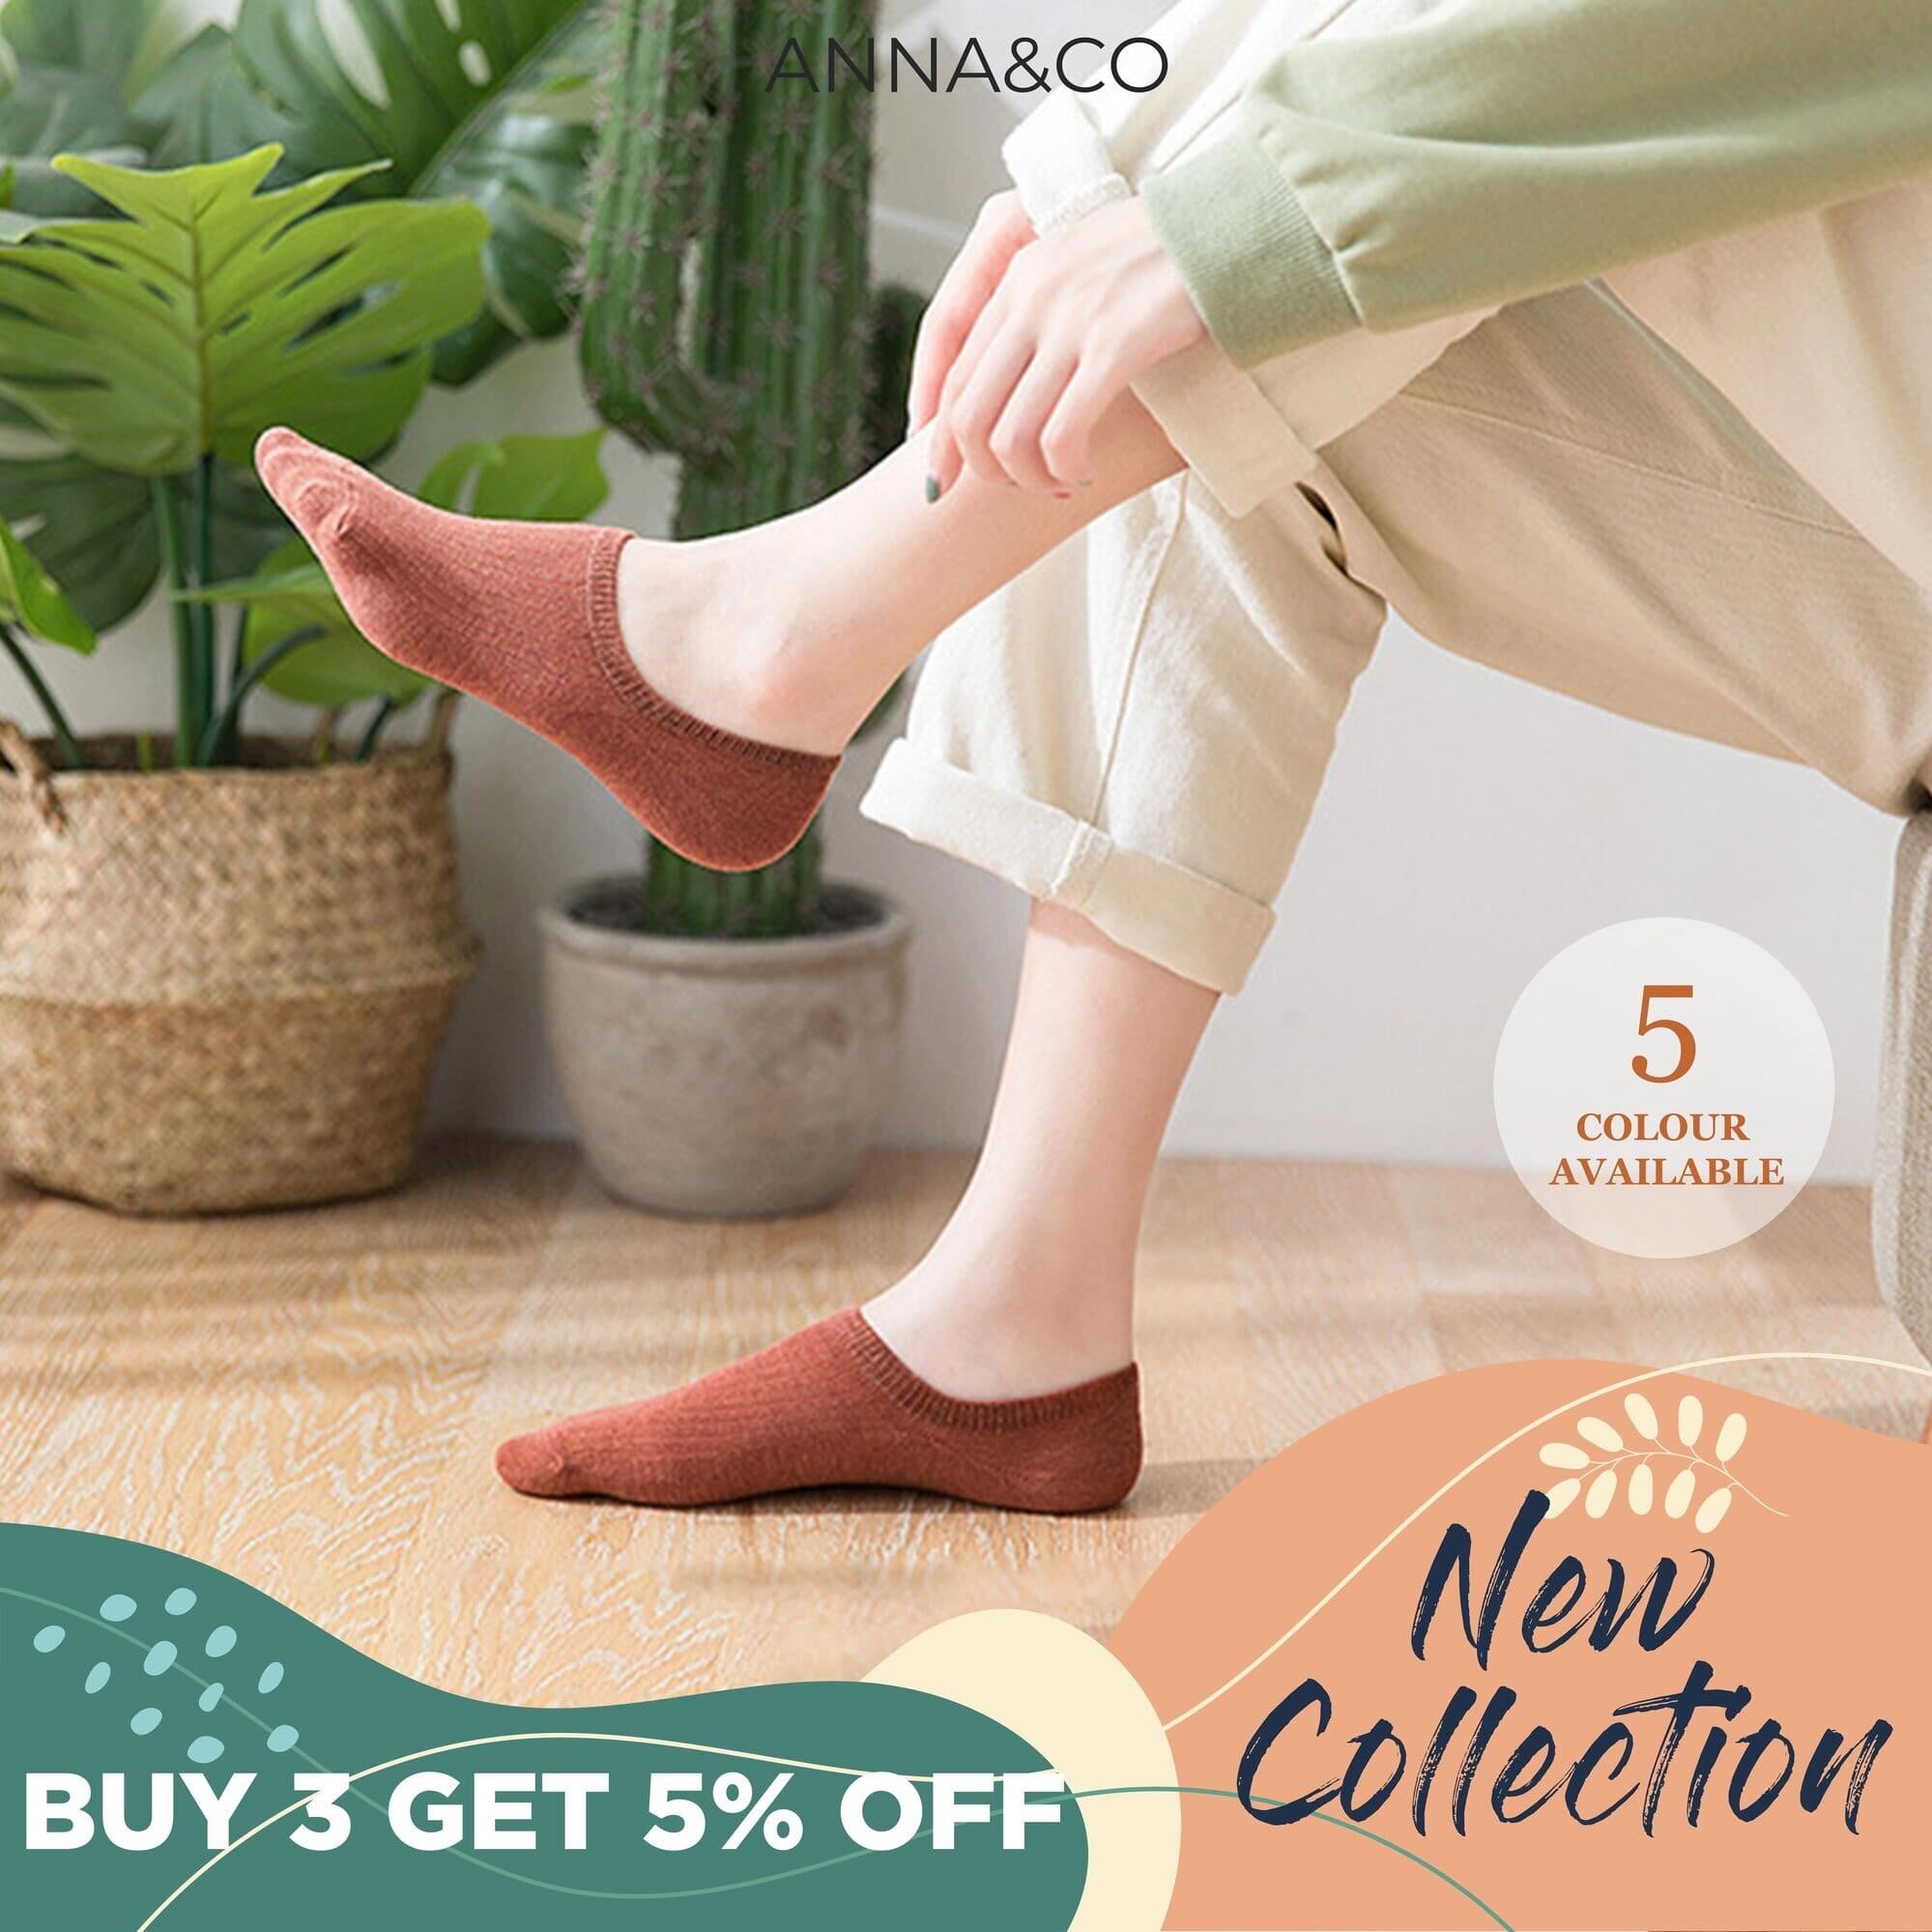 [READY STOCK] AnnaCo Zora Women Cotton Socks One Pair Anti Slip Premium Invisible Breathable Ankle Low Cut Cotton Socks S28 Zora Stokin Cotton Wanita Perumpuan Korean Style Plain Color S28